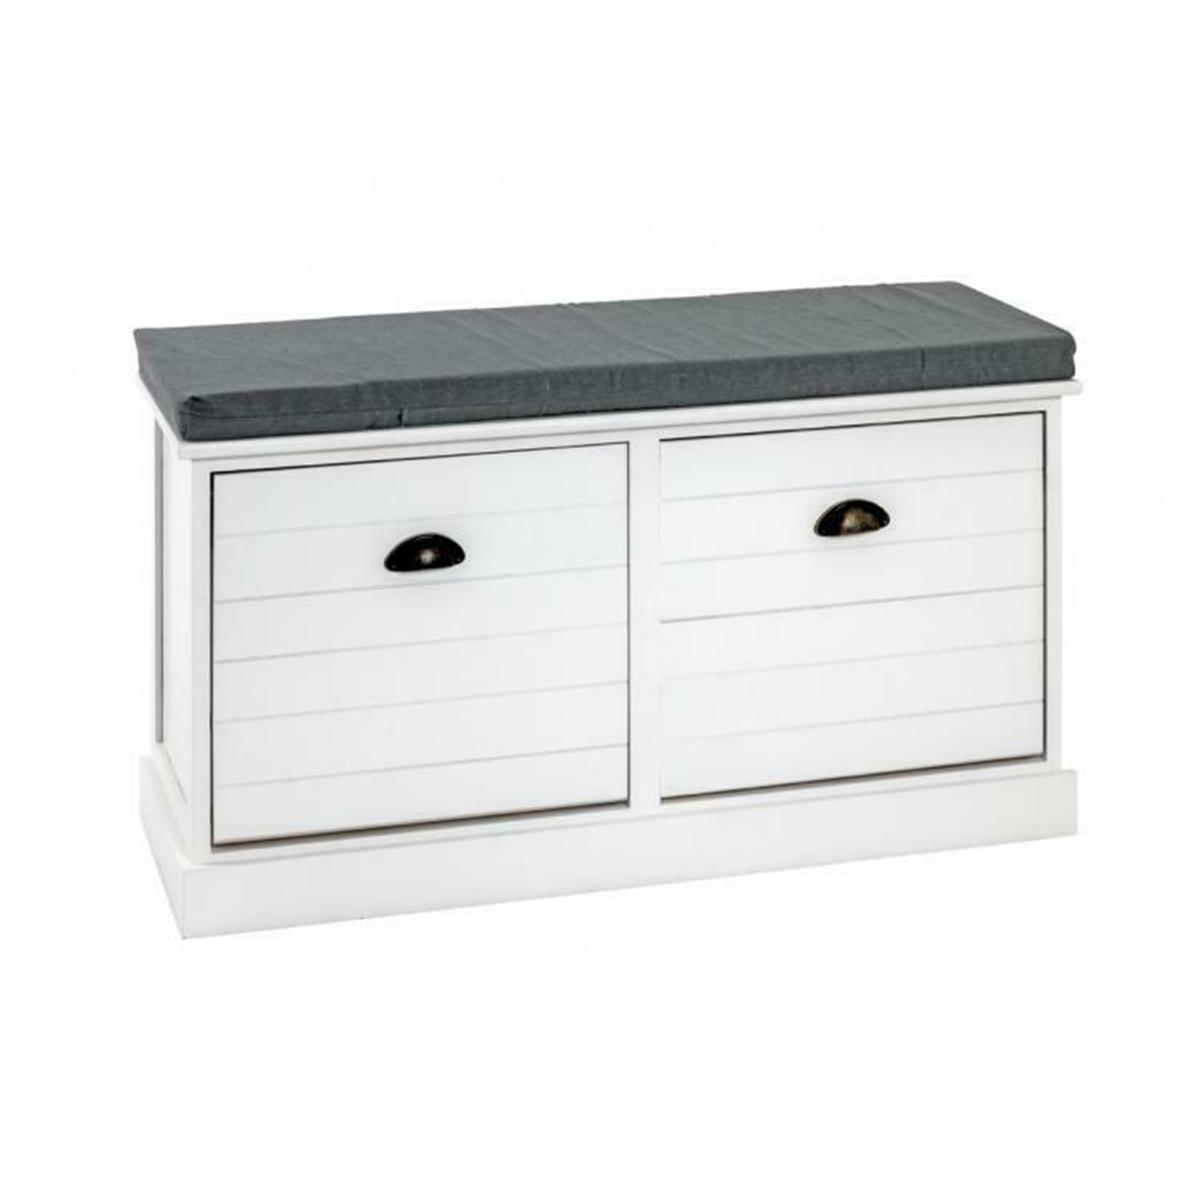 Pegane Banc coloris blanc-gris en bois - L 70 x P 35 x H 50 cm